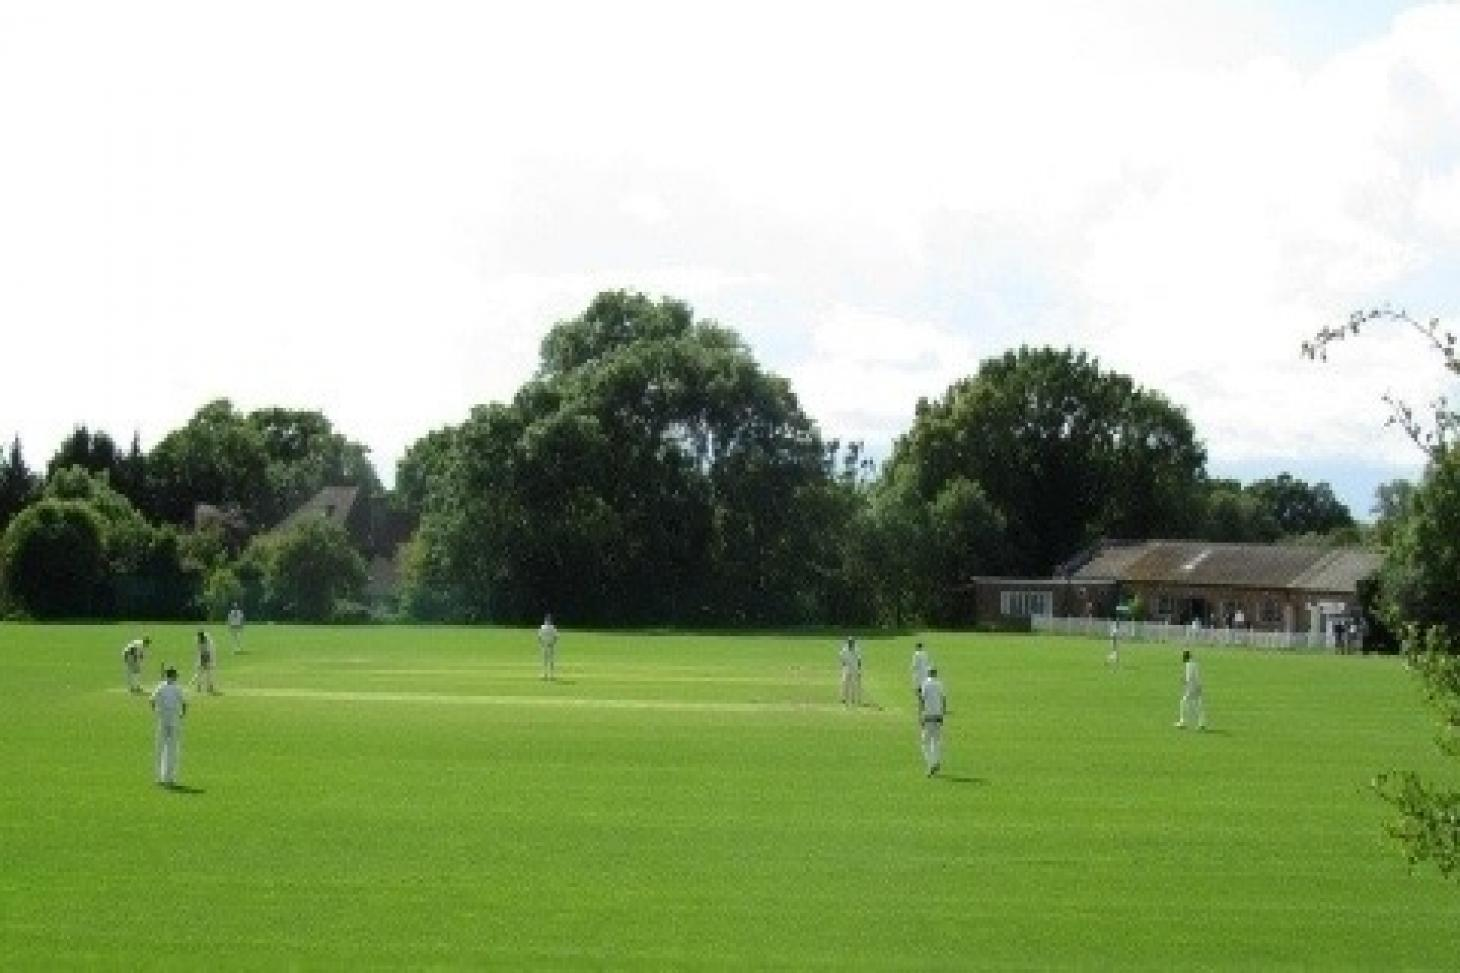 Streatham & Marlborough Cricket Club Nets | Artificial cricket facilities